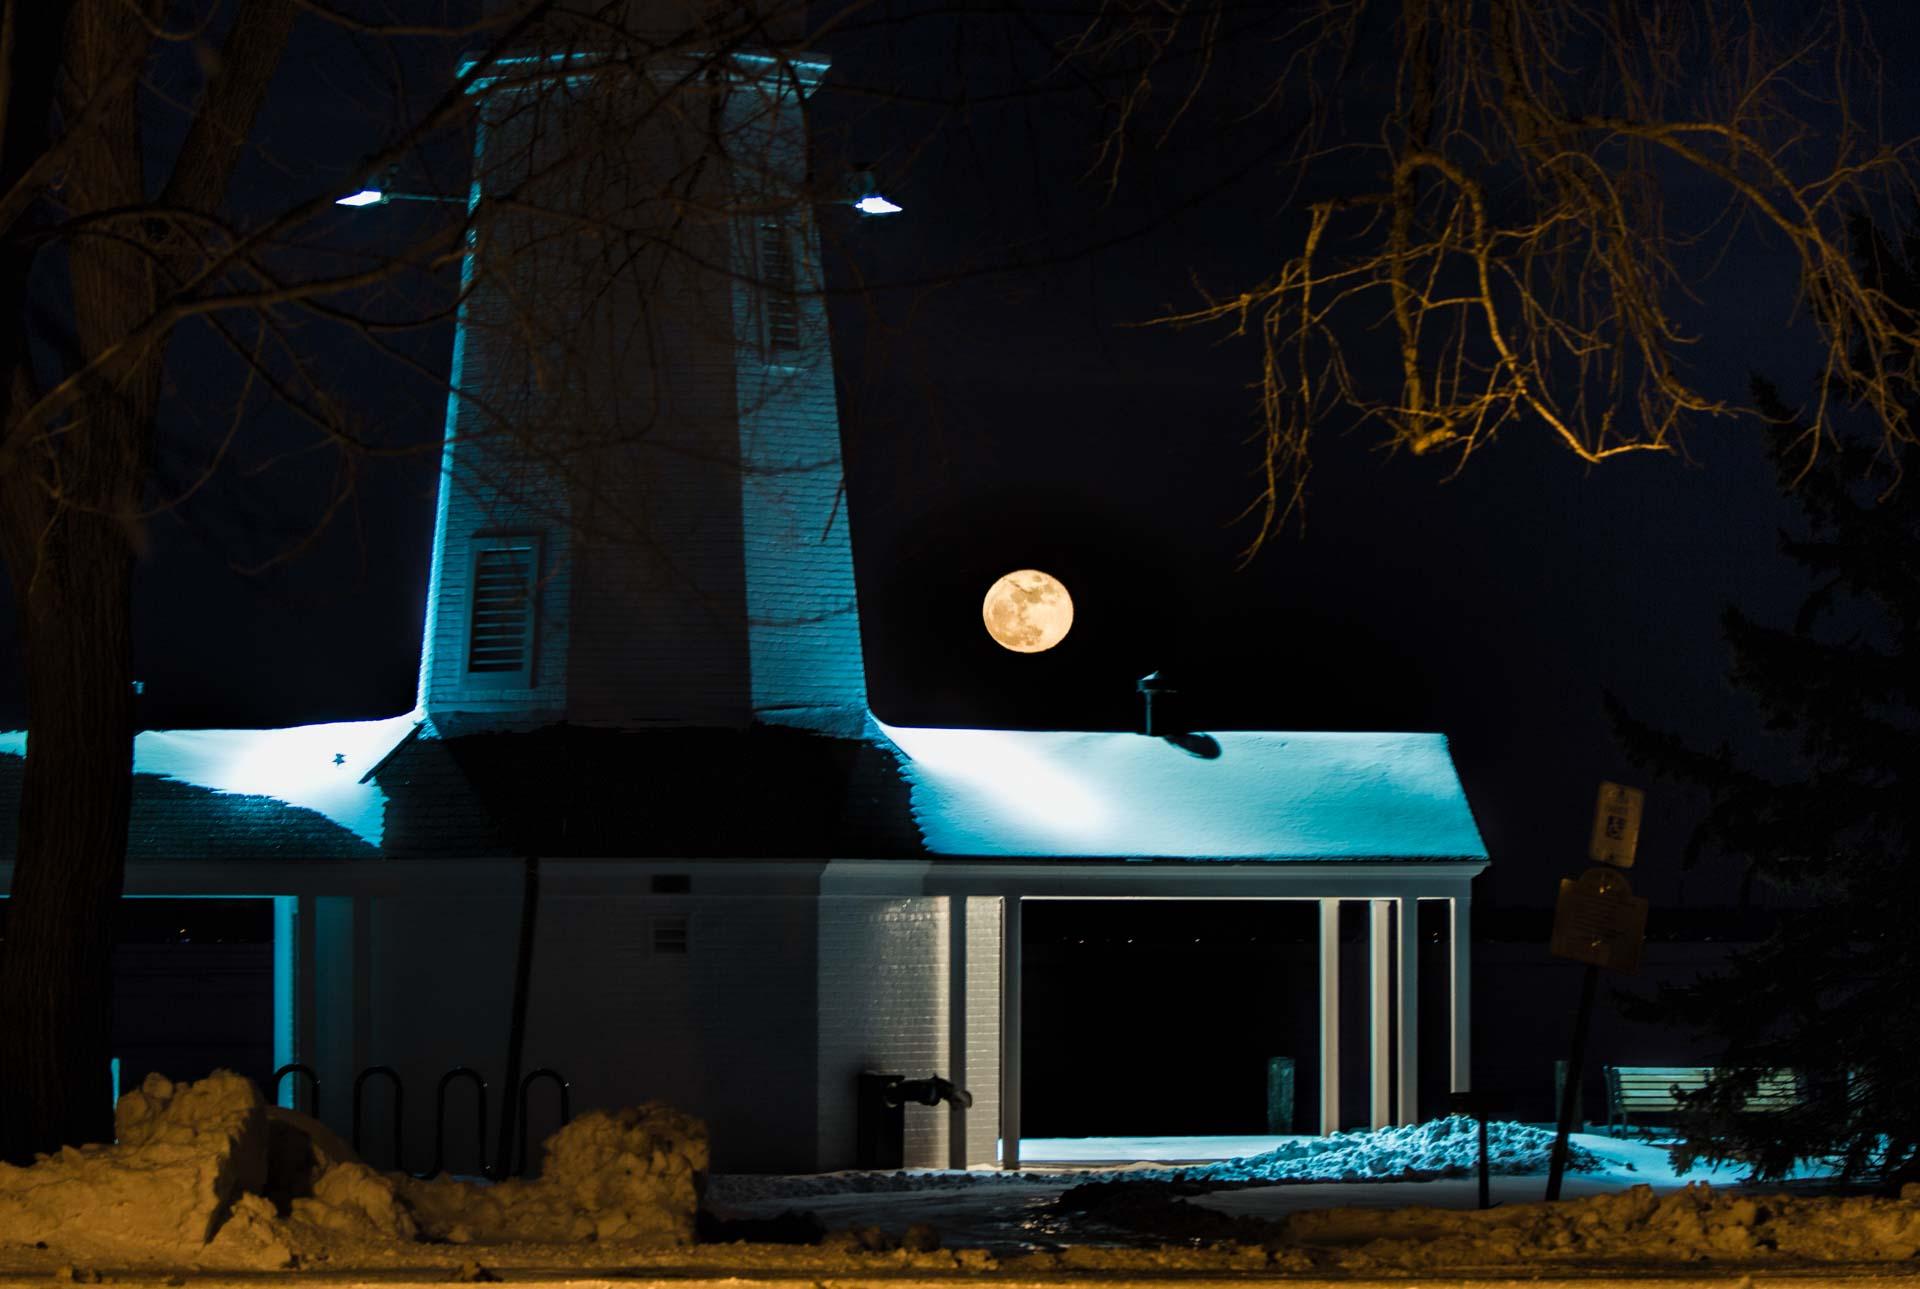 Moon rise over Lake Winnebago